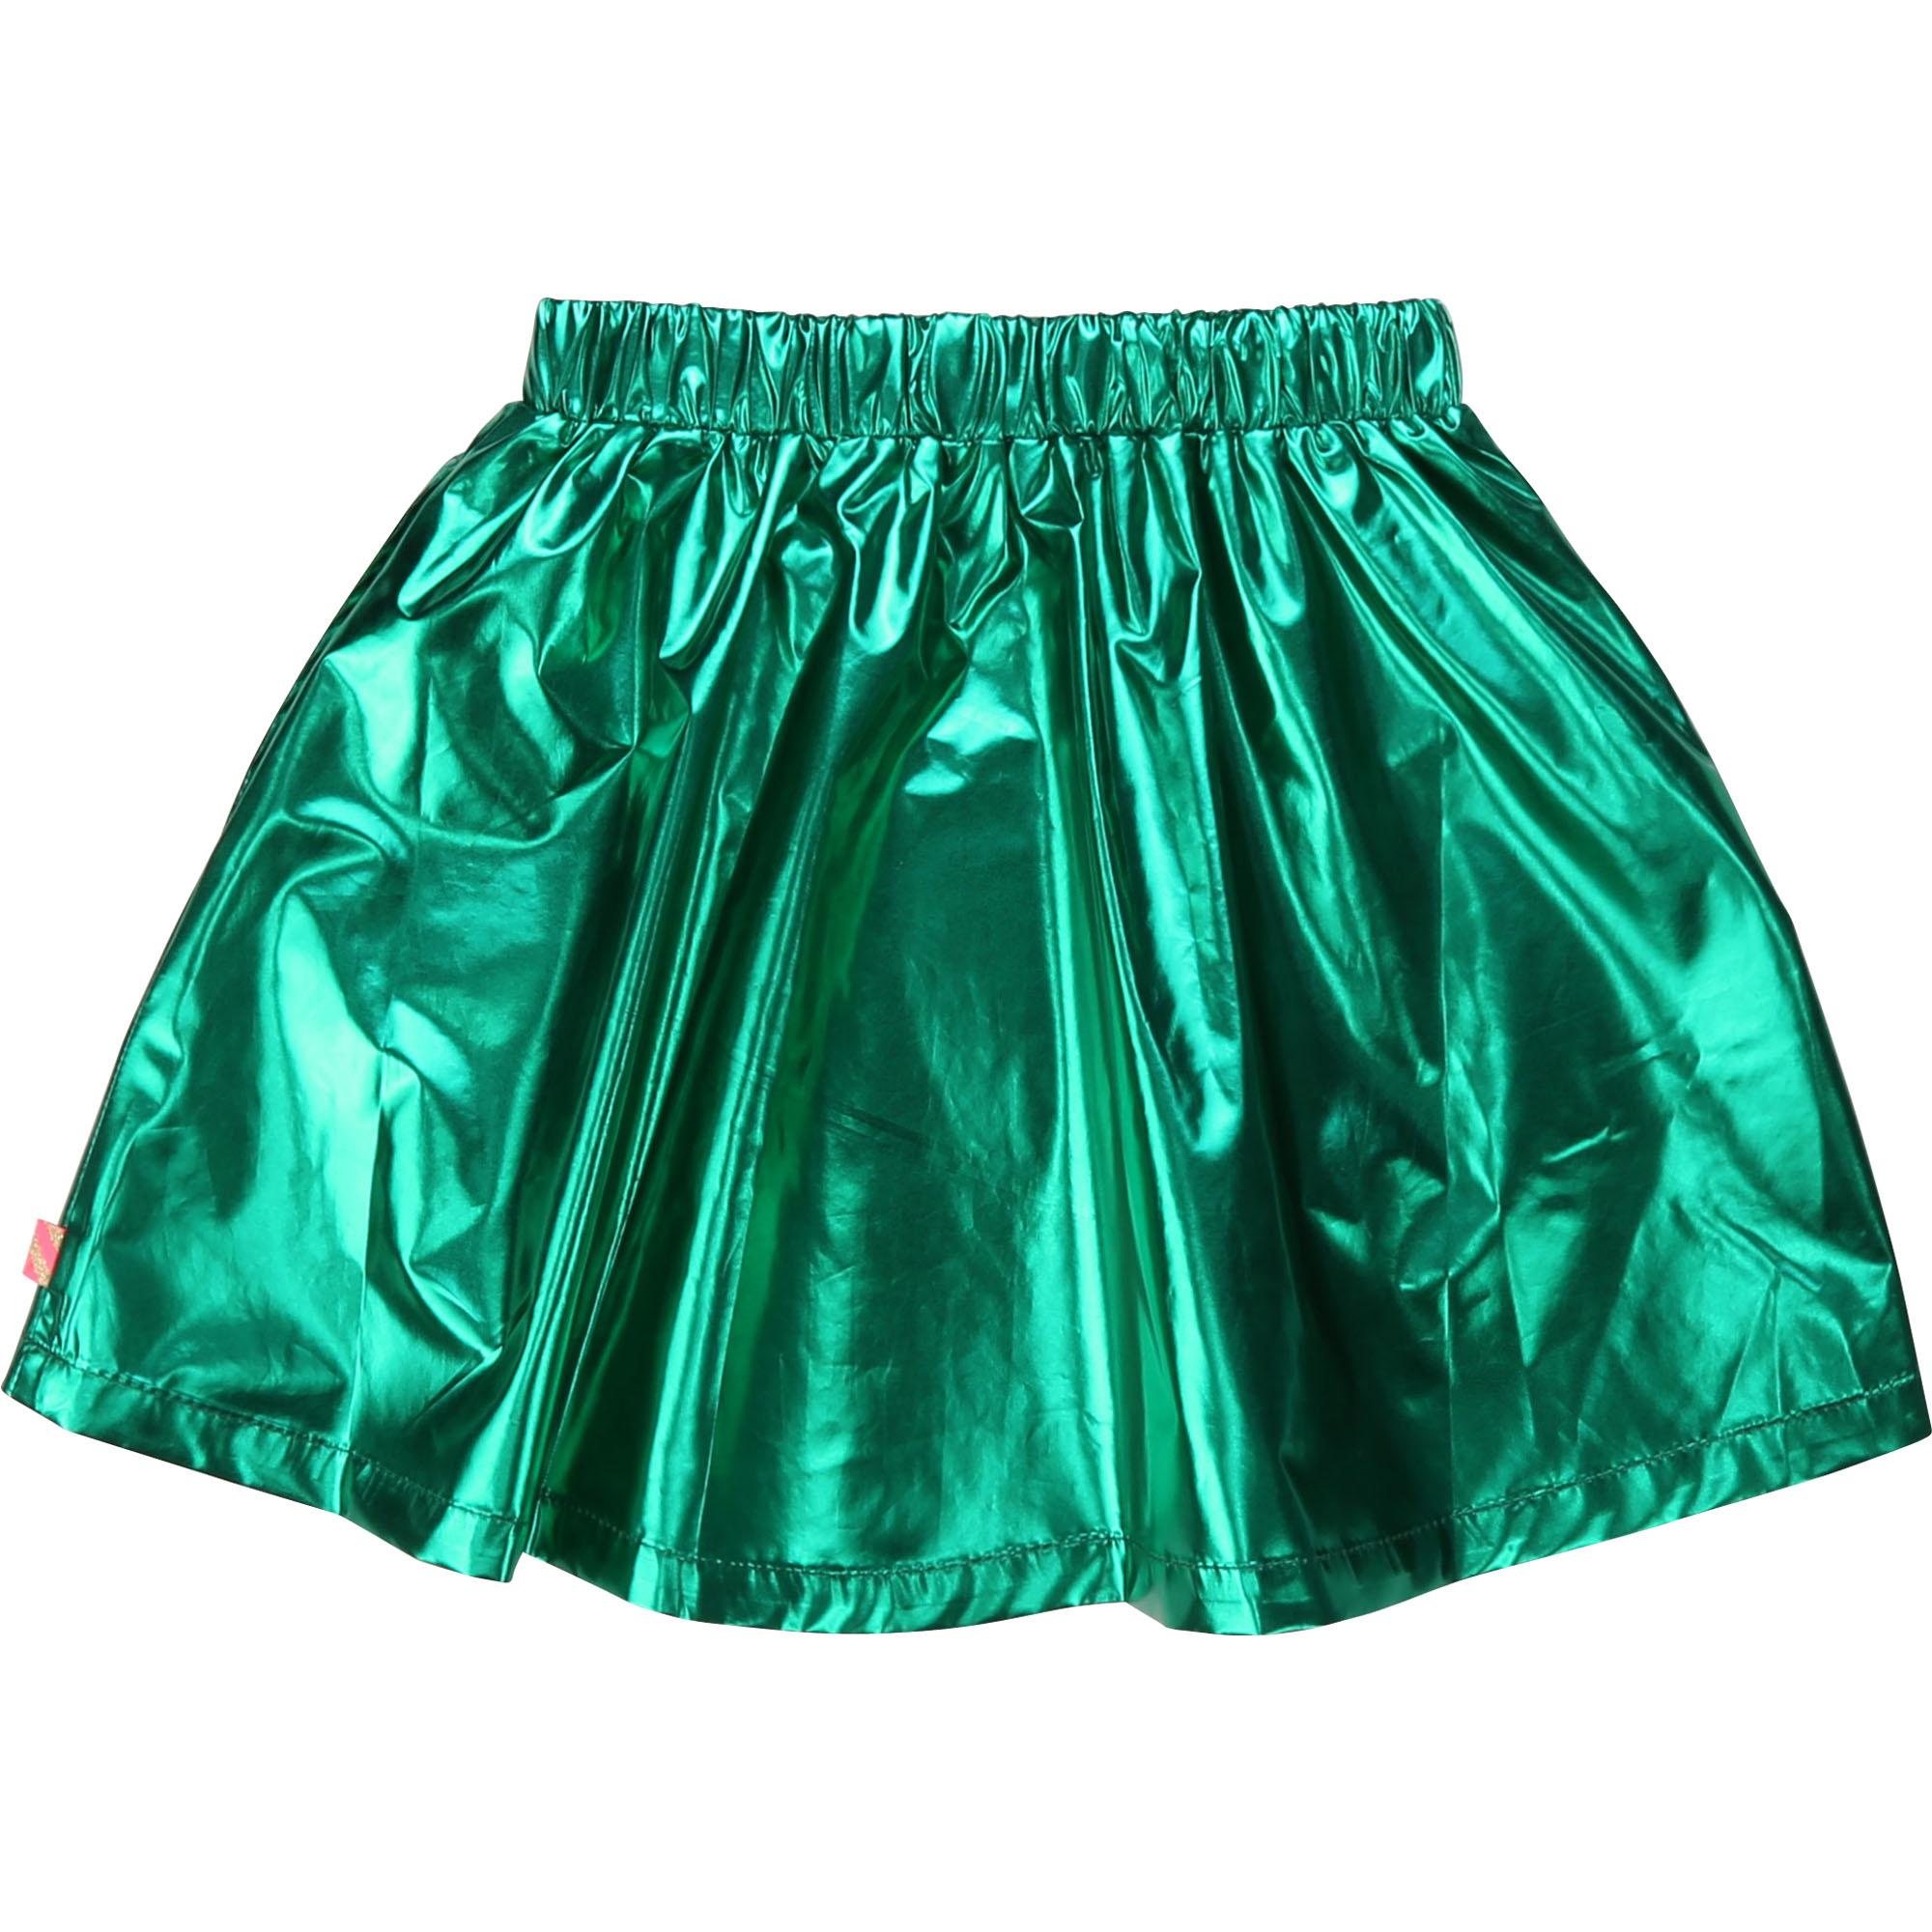 BILLIEBLUSH jupe courte métallisée-5